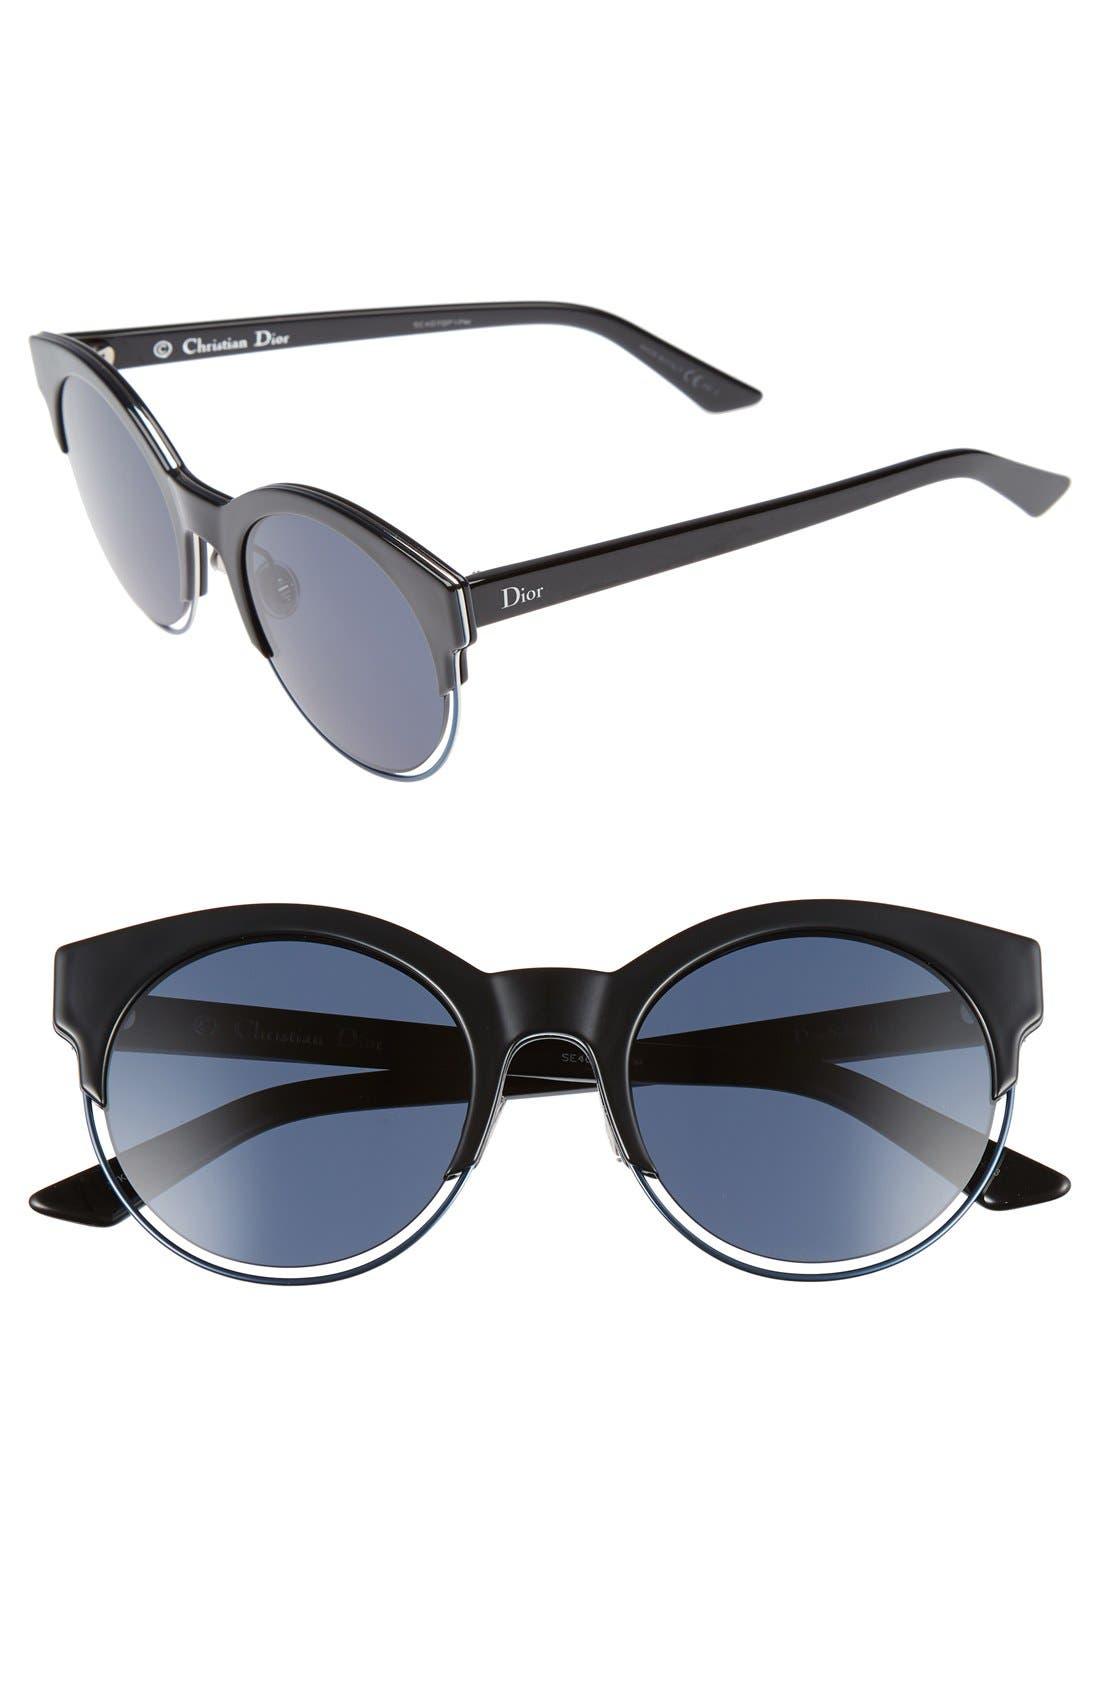 Main Image - Dior Siderall 1 53mm Round Sunglasses